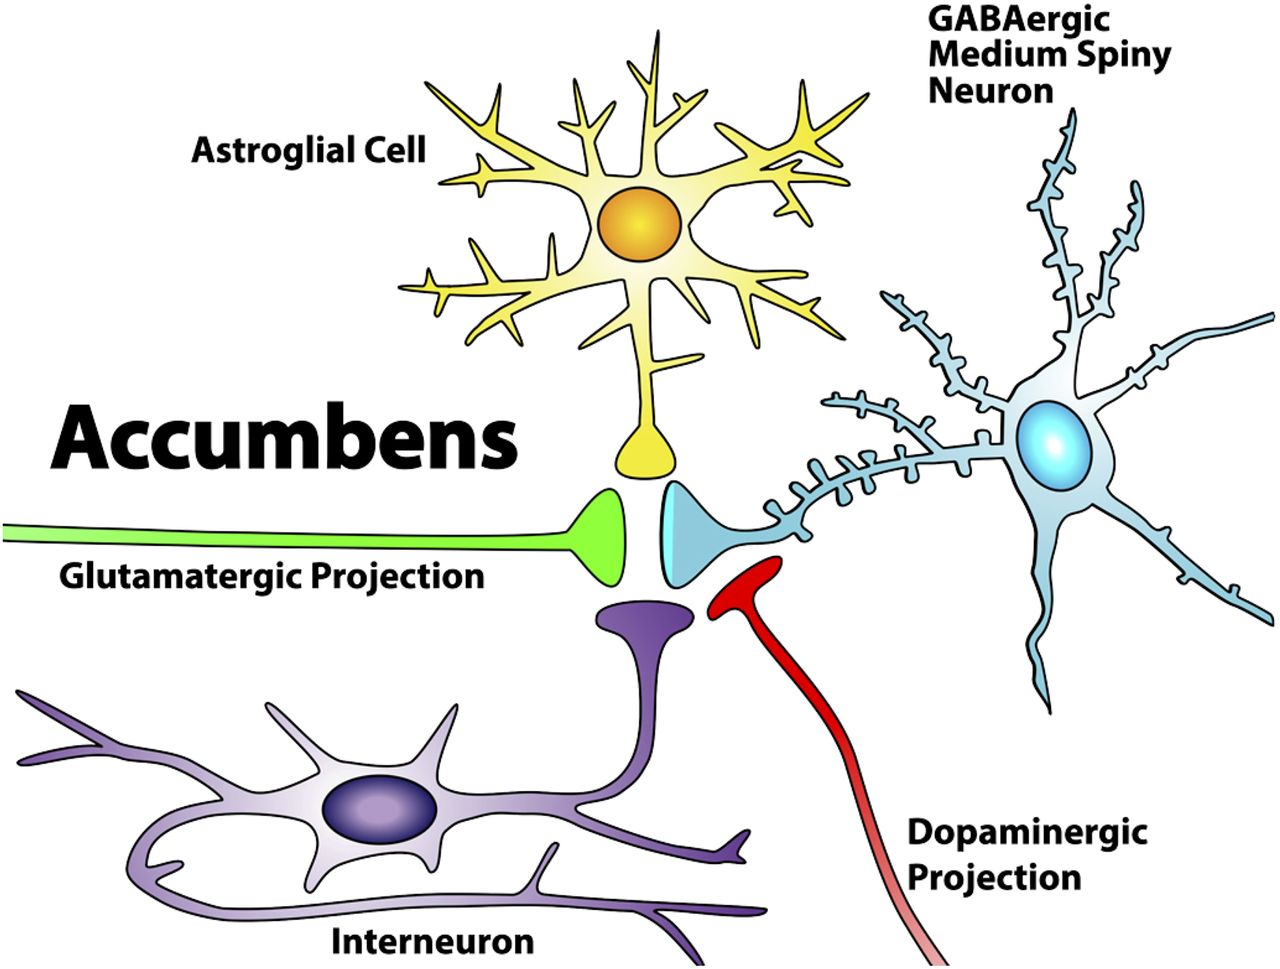 The Nucleus Accumbens: Mechanisms of Addiction across Drug Classes ...